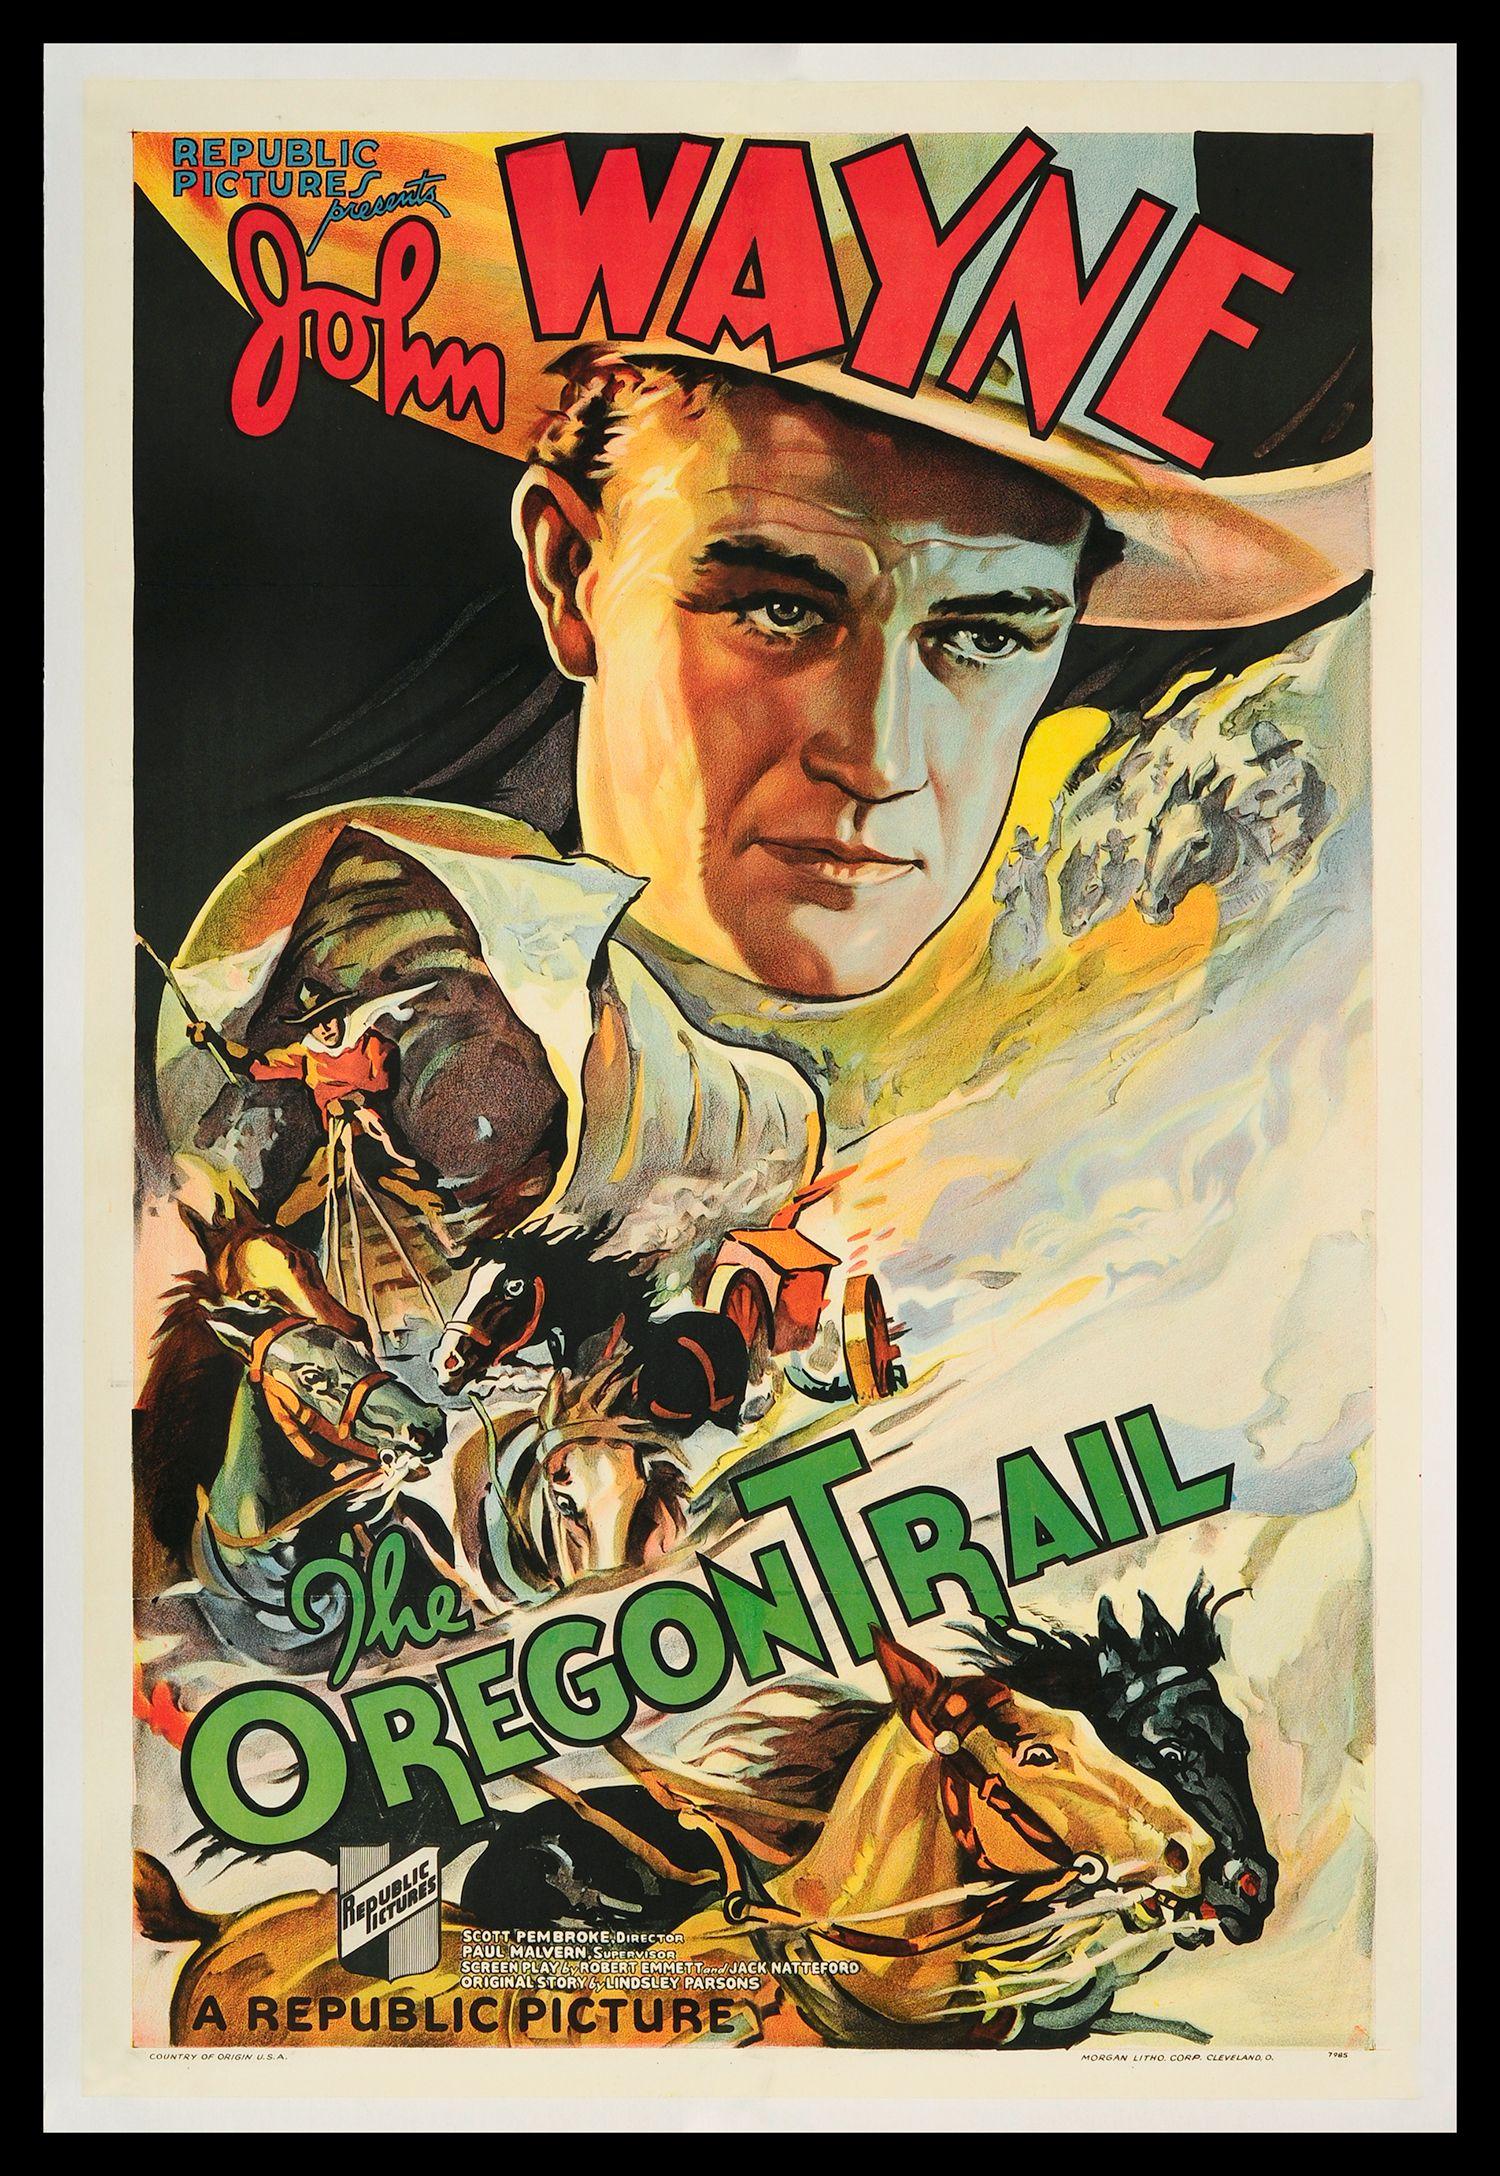 movie posters 1940s | john wayne us posters 1930s-1940s - fff movie